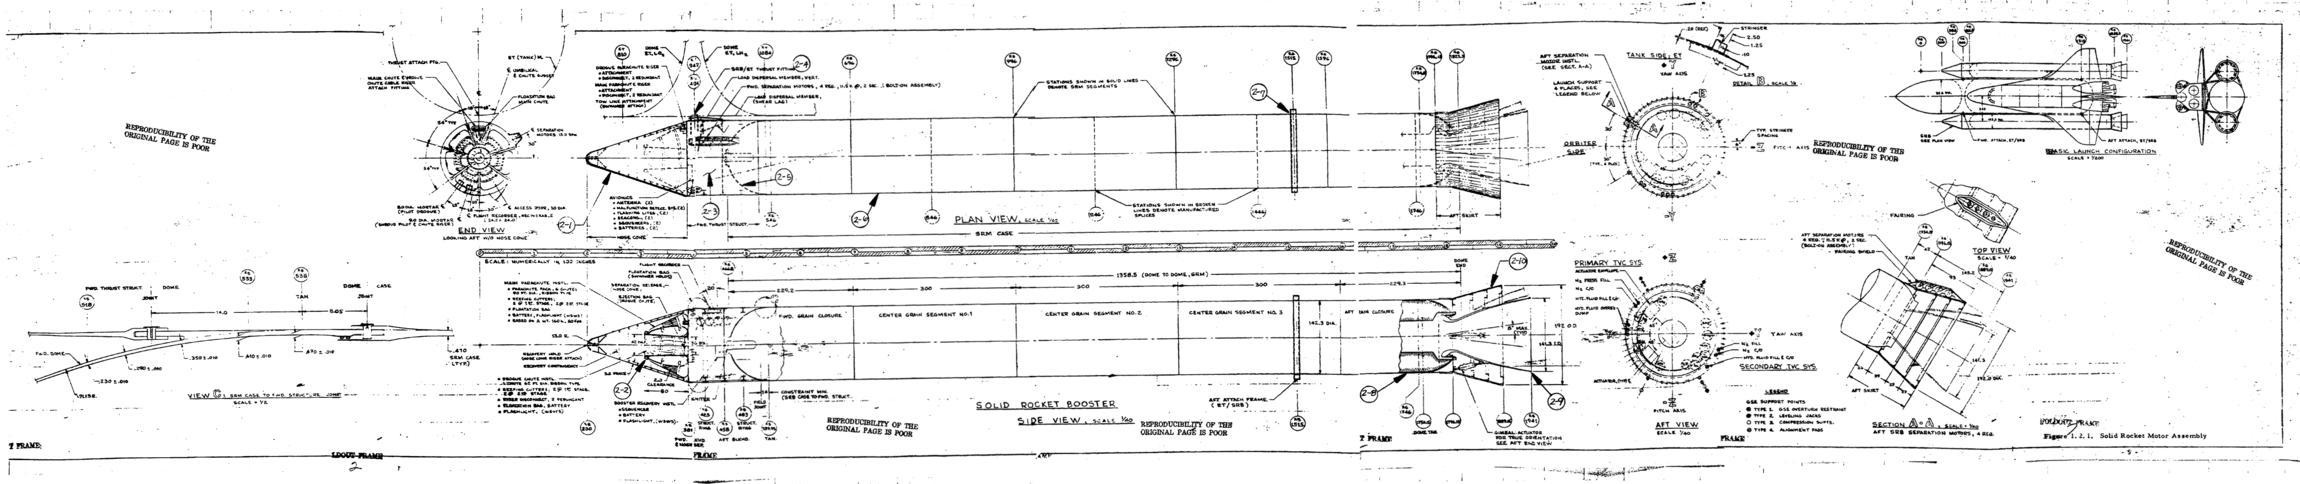 Nasa Space Shuttle Orbiter Hull Design Blueprints From Tech Engine Diagram 19740027168 0052300x484 176 Kb